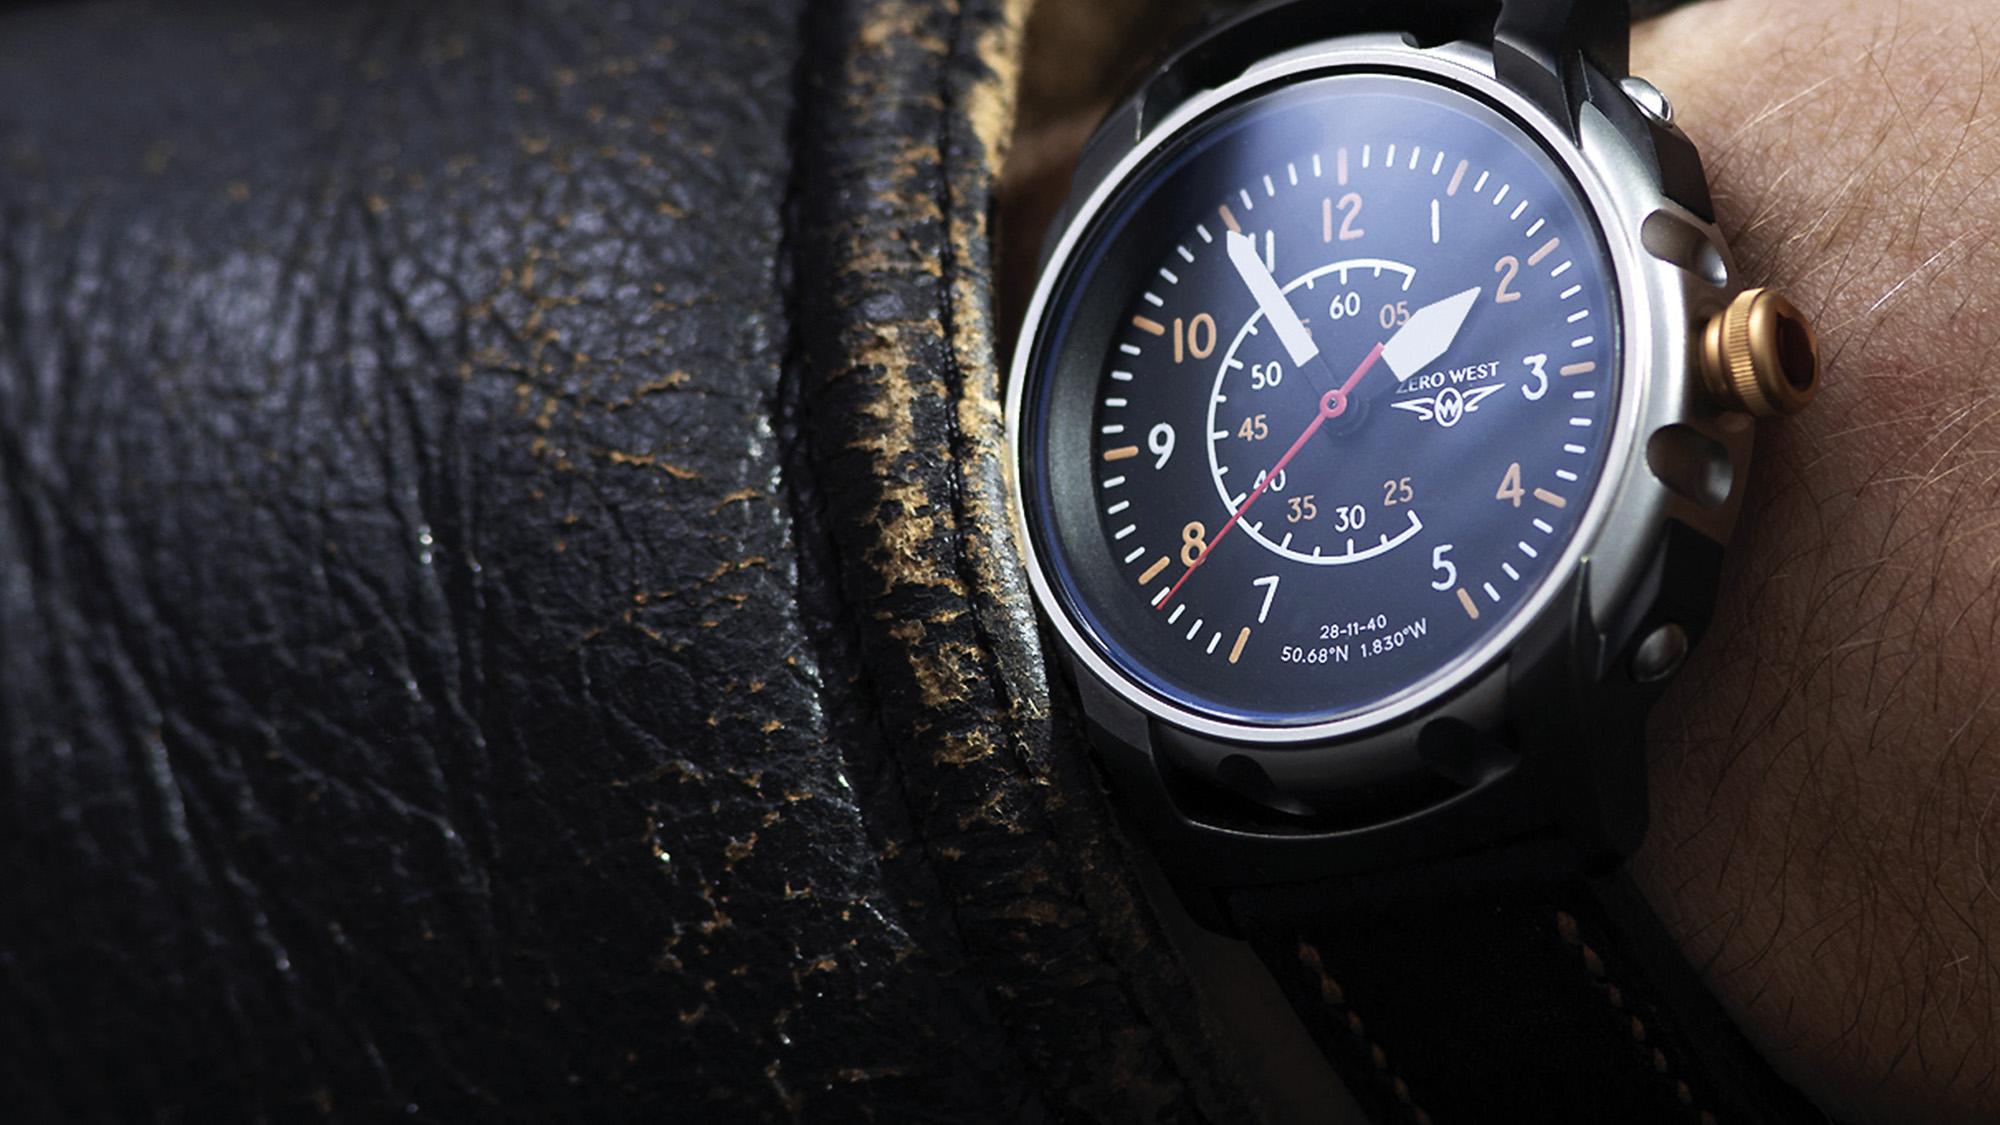 Zero West S4-P9427 watch